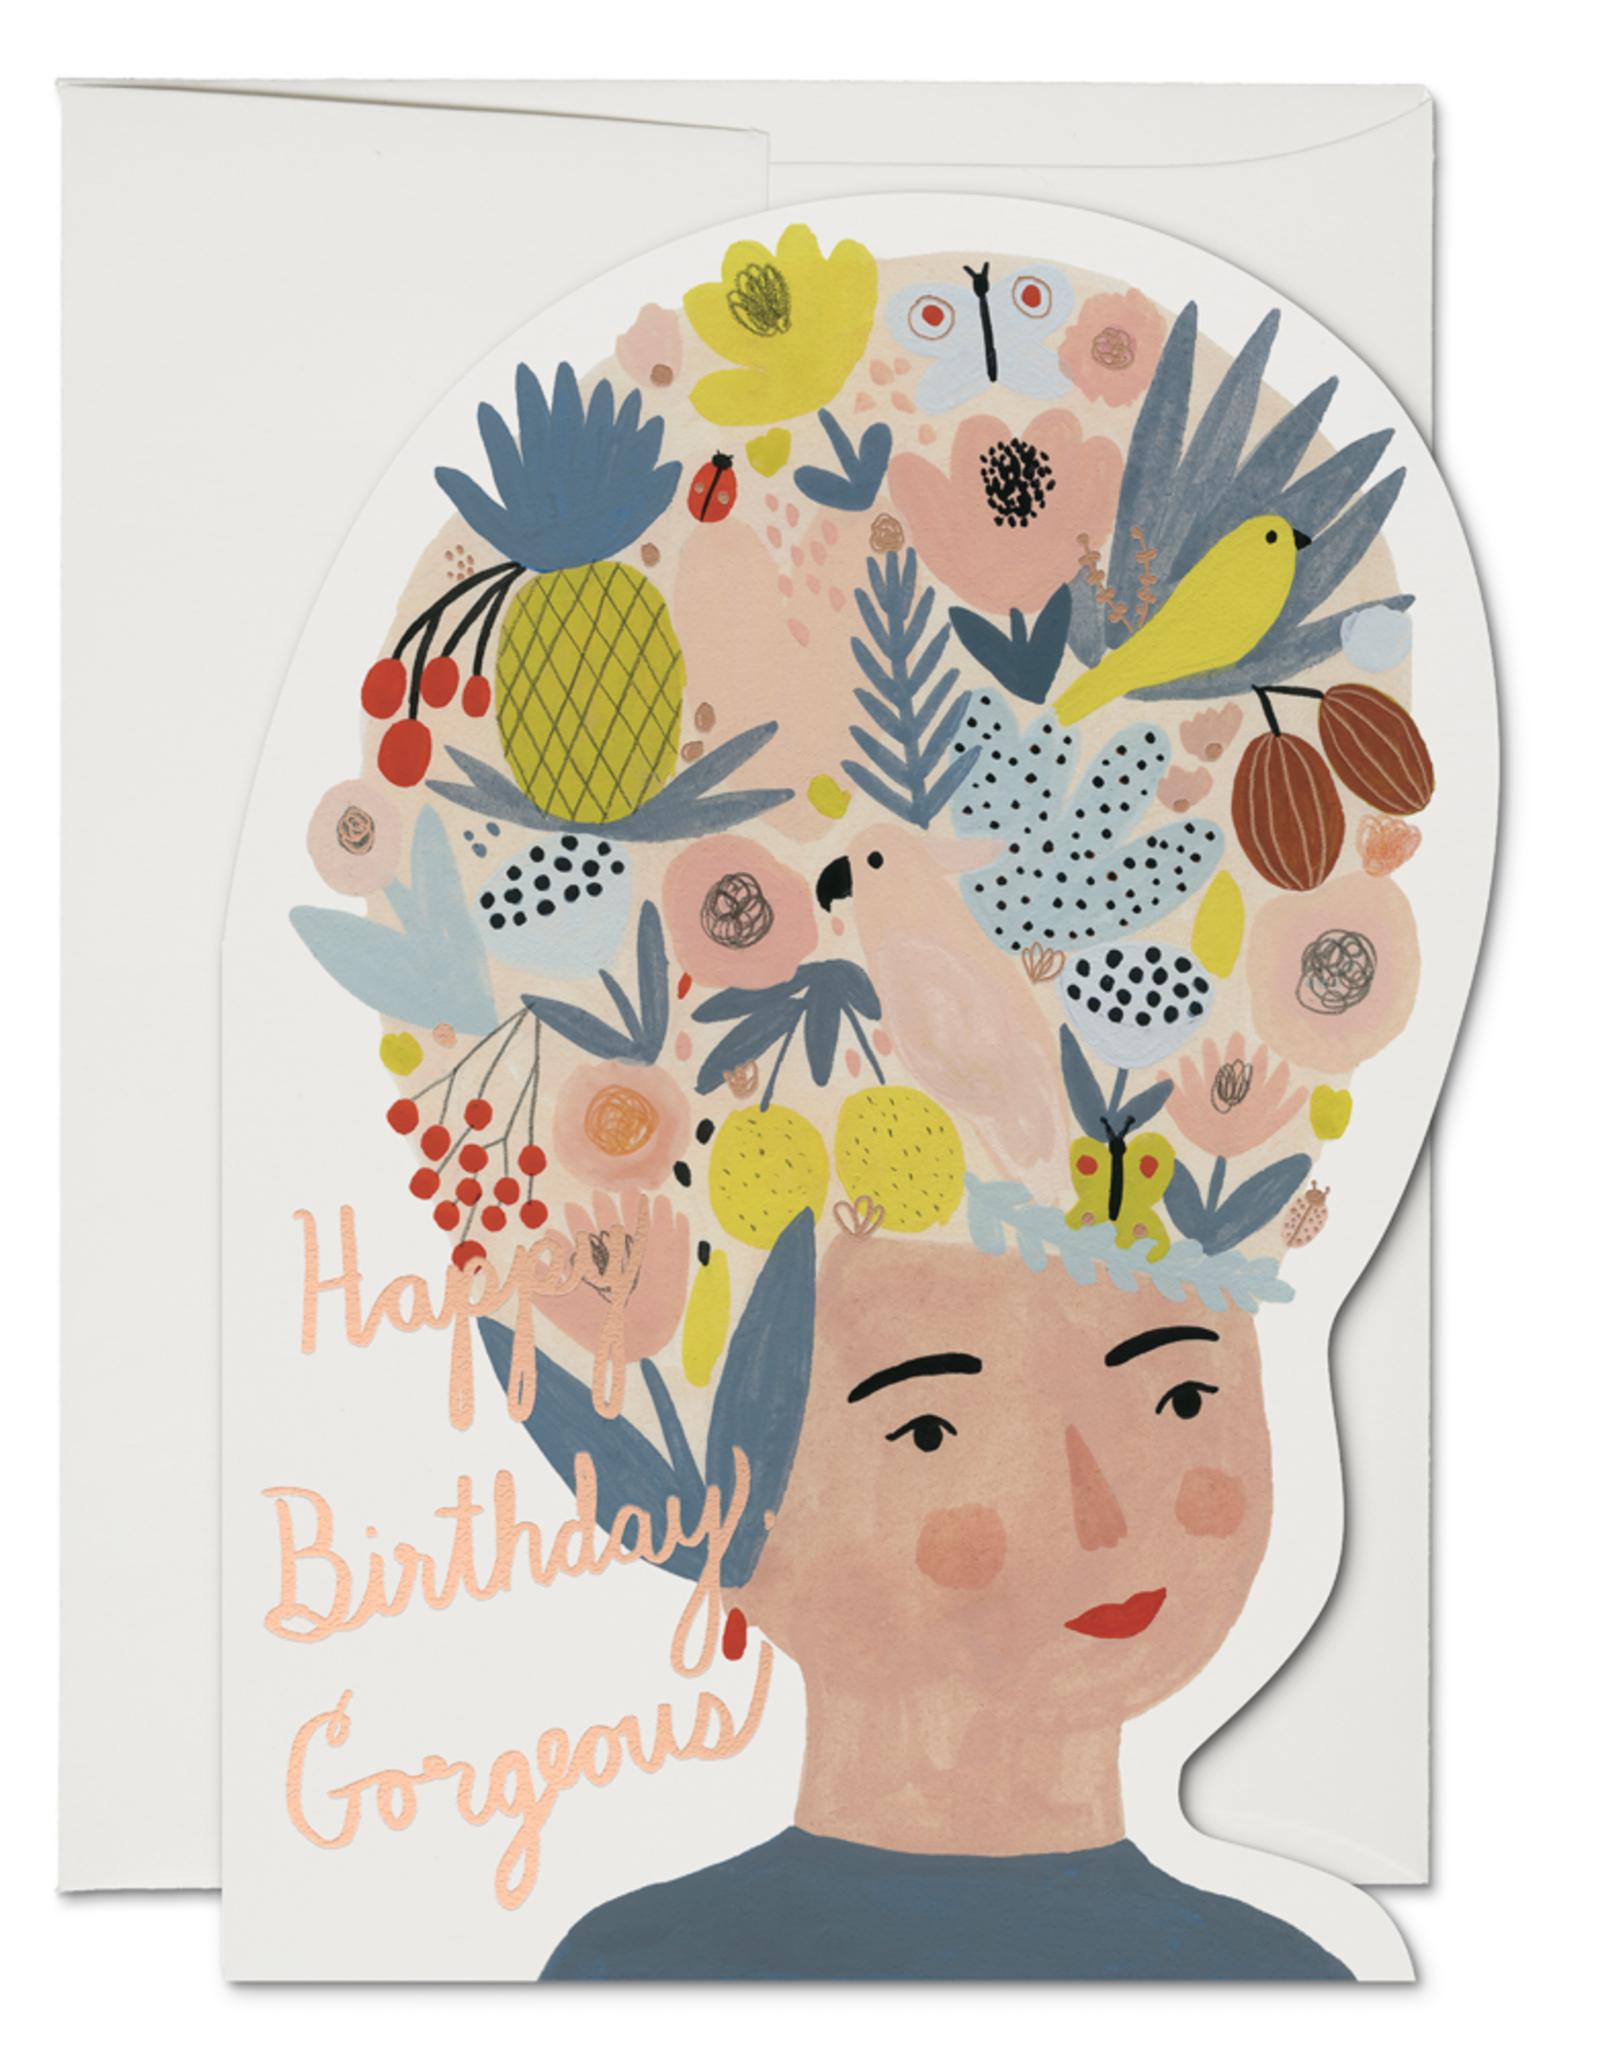 Happy Birthday Gorgeous Fruit Hat Greeting Card